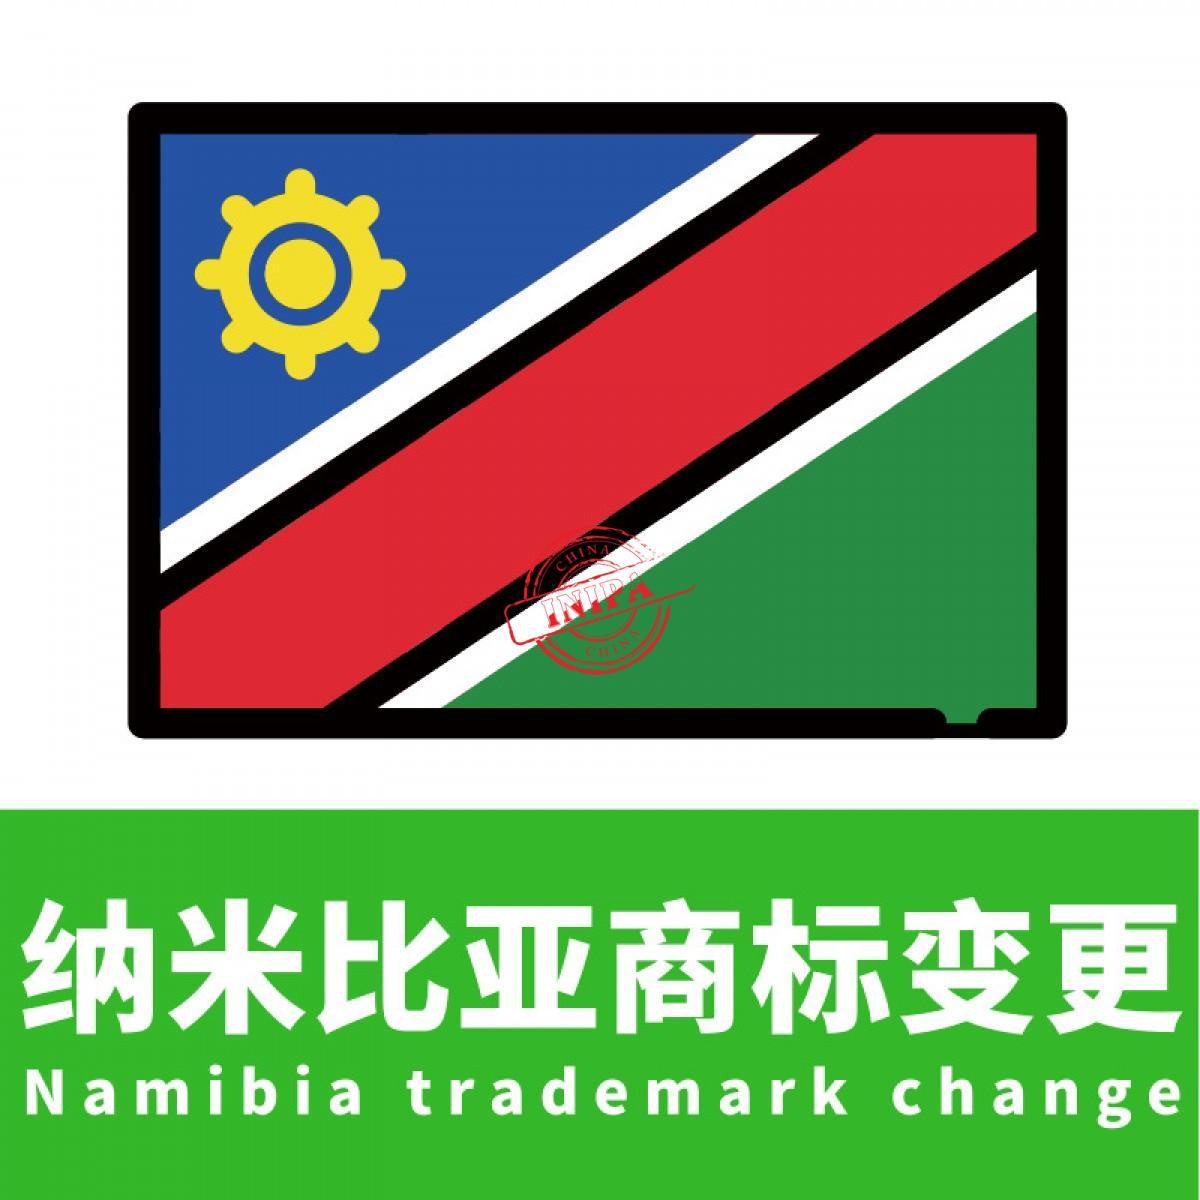 纳米比亚商标变更/Namibia trademark change